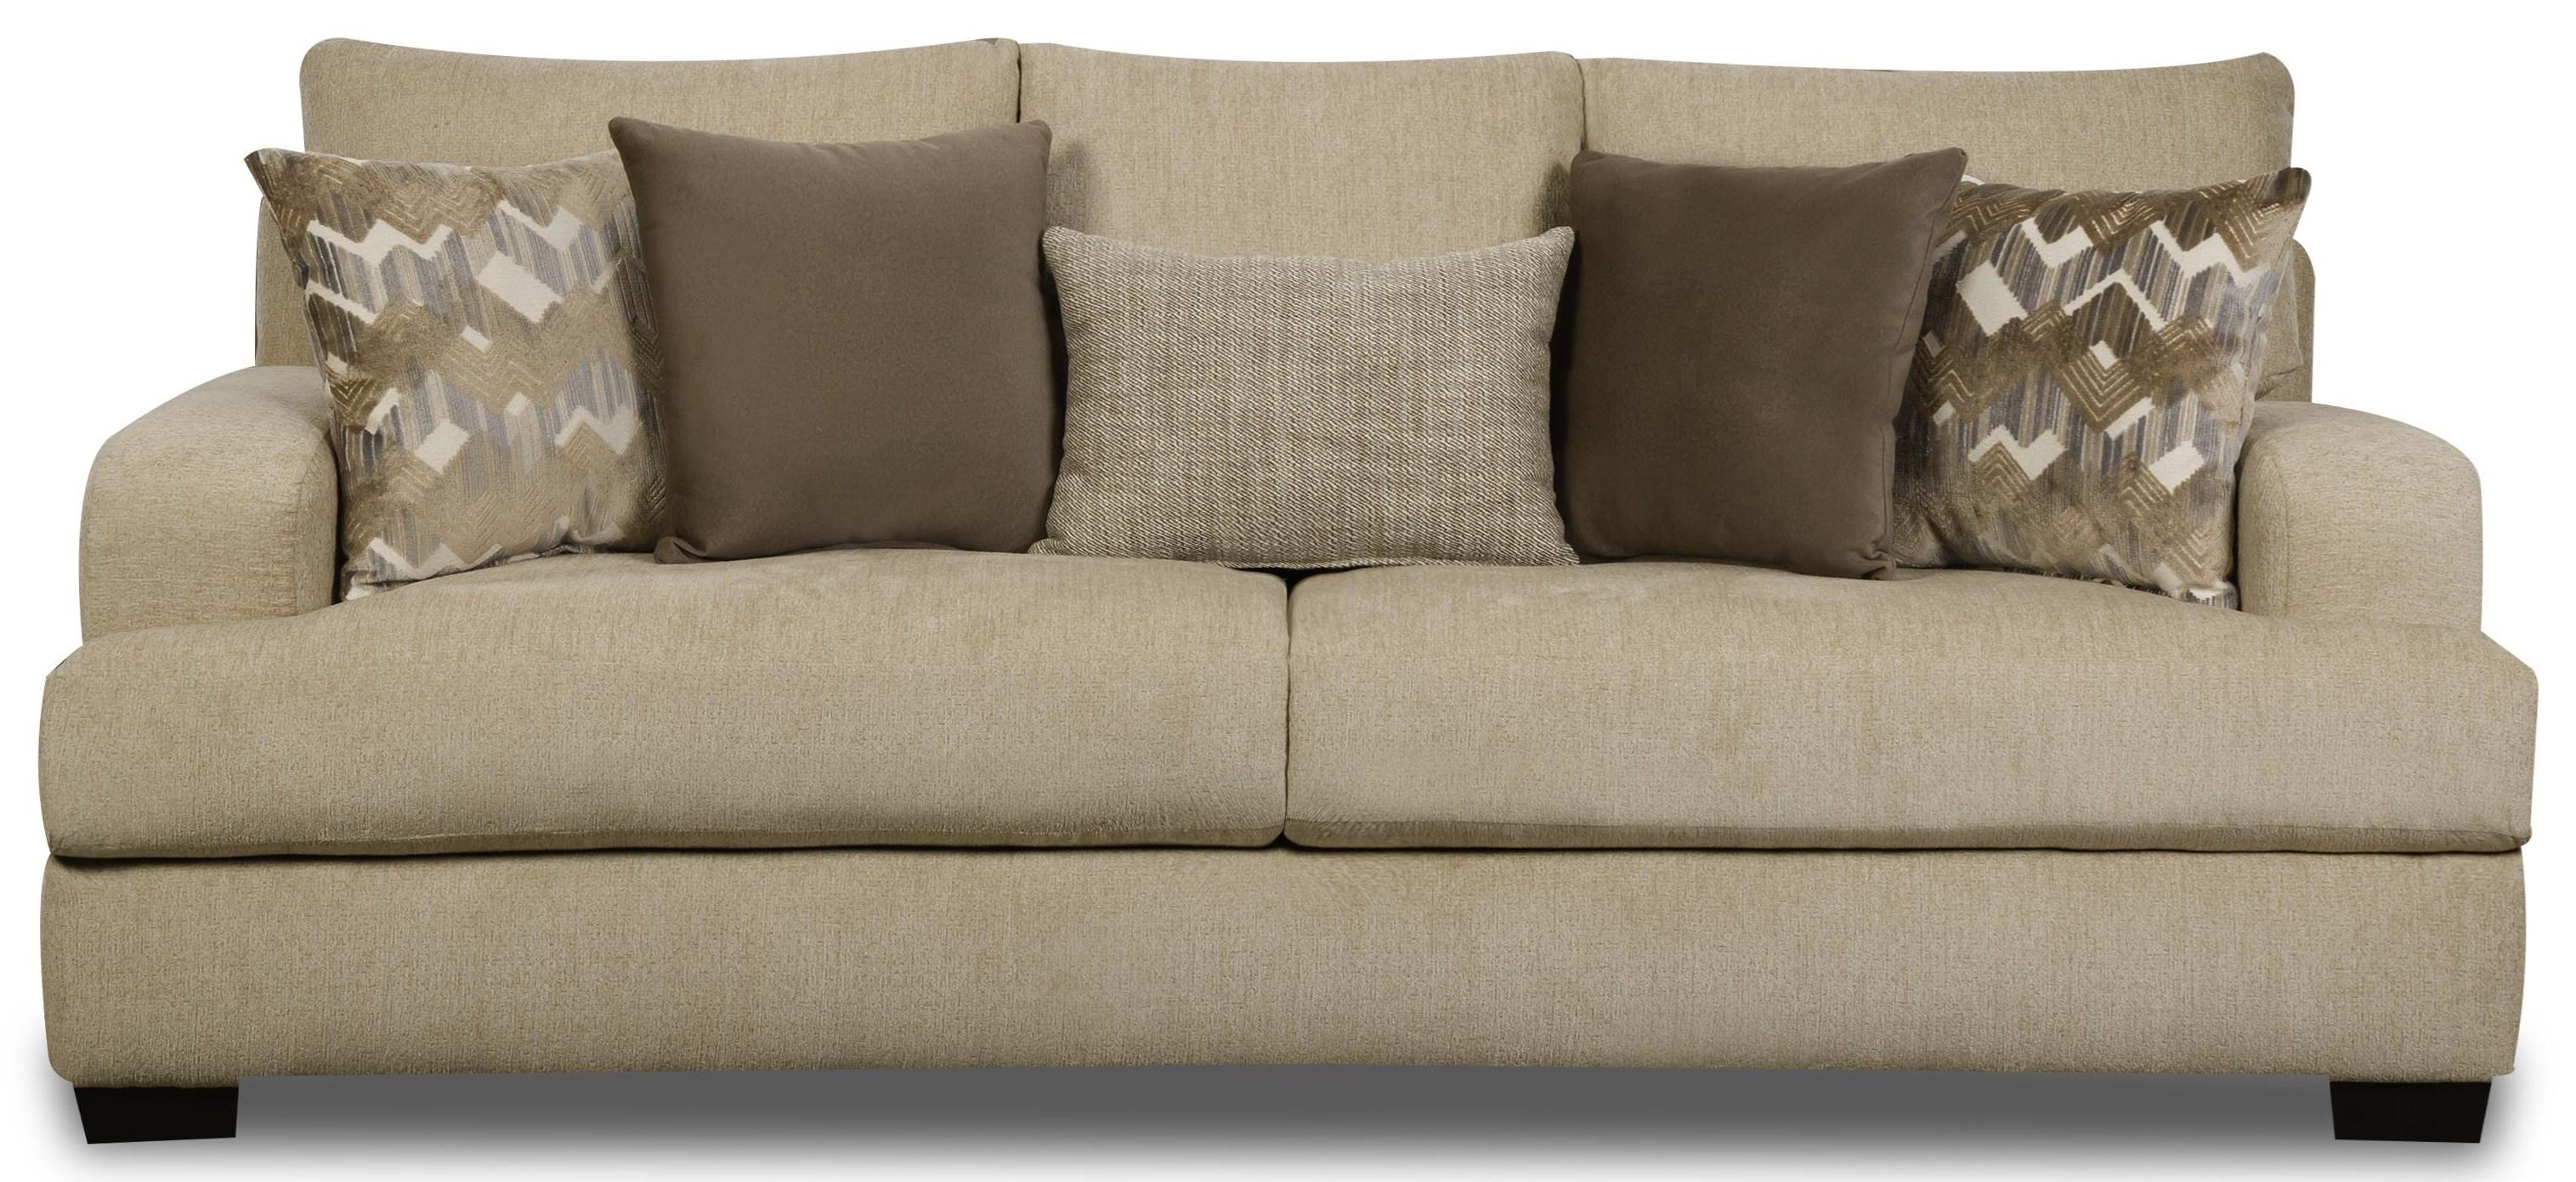 5200 Sofa by Corinthian at Furniture Fair - North Carolina